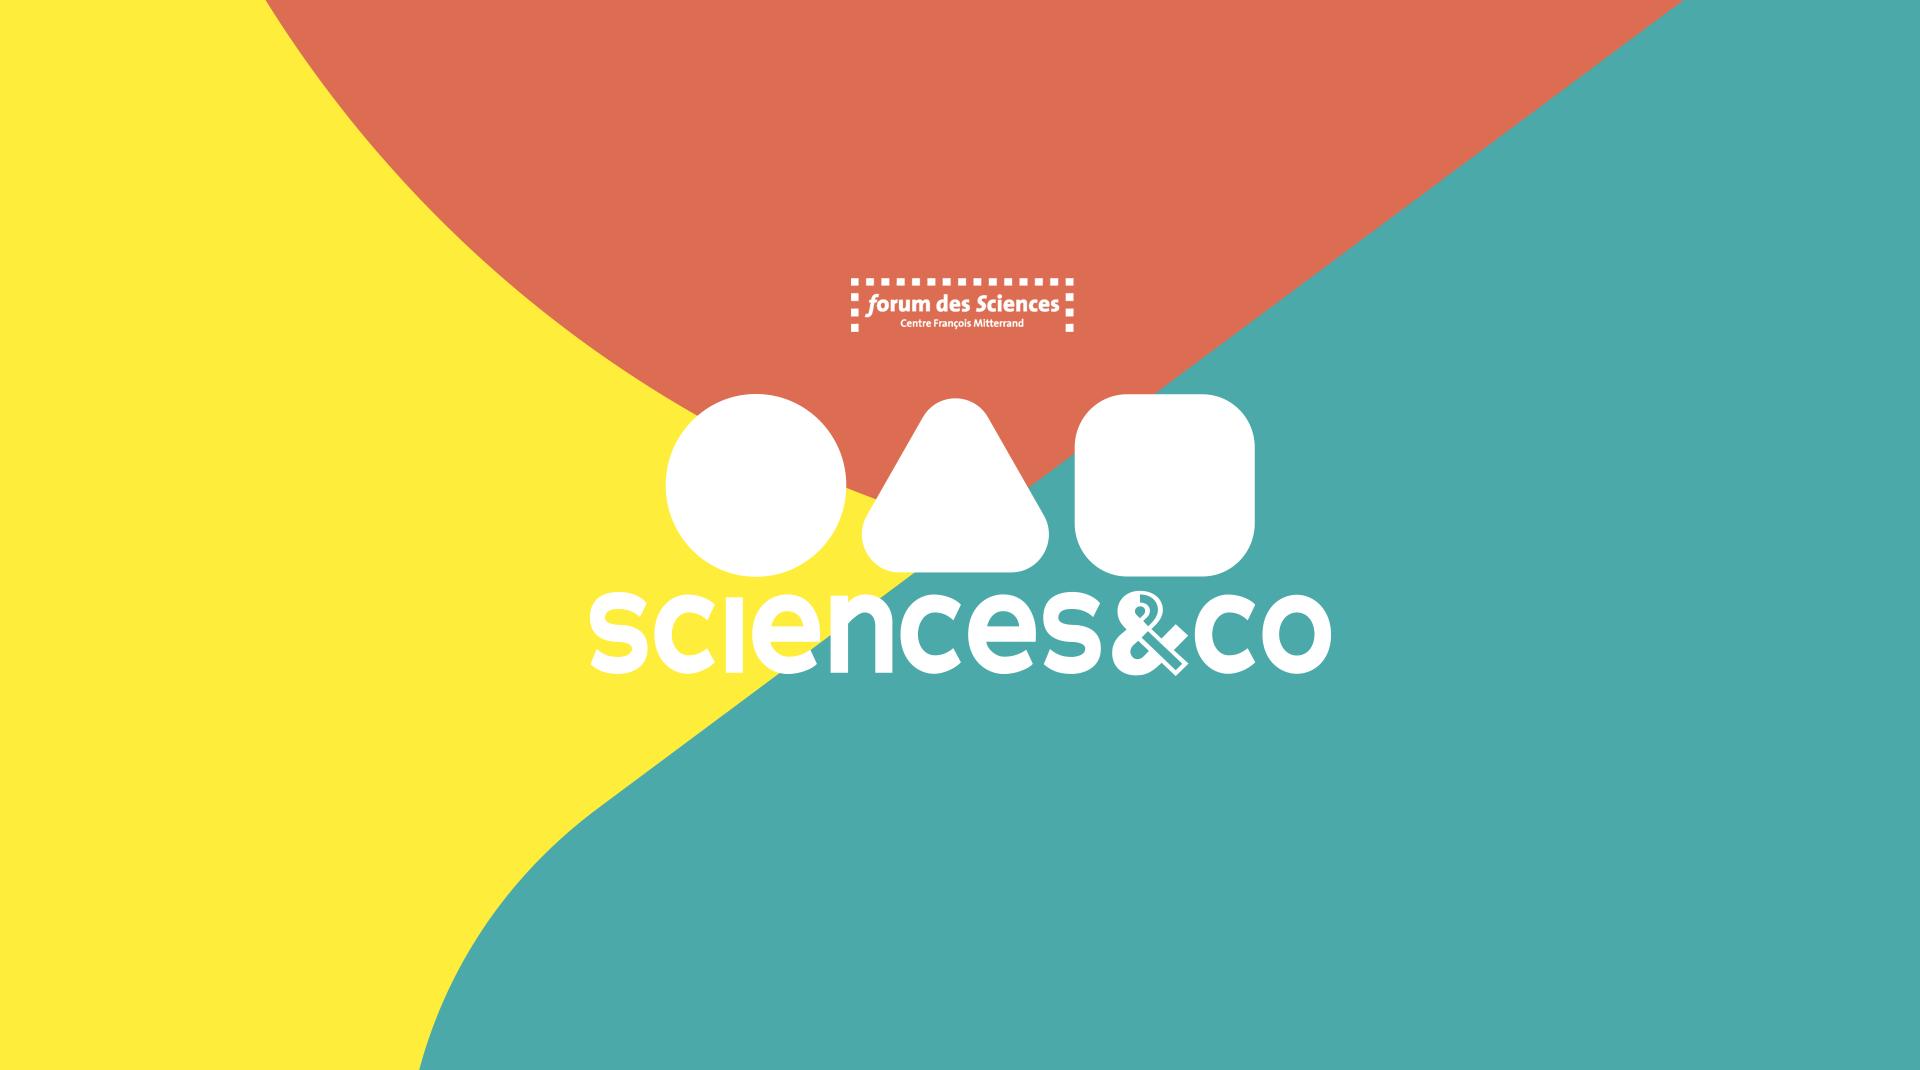 Sciencesnco-BFPTC-01